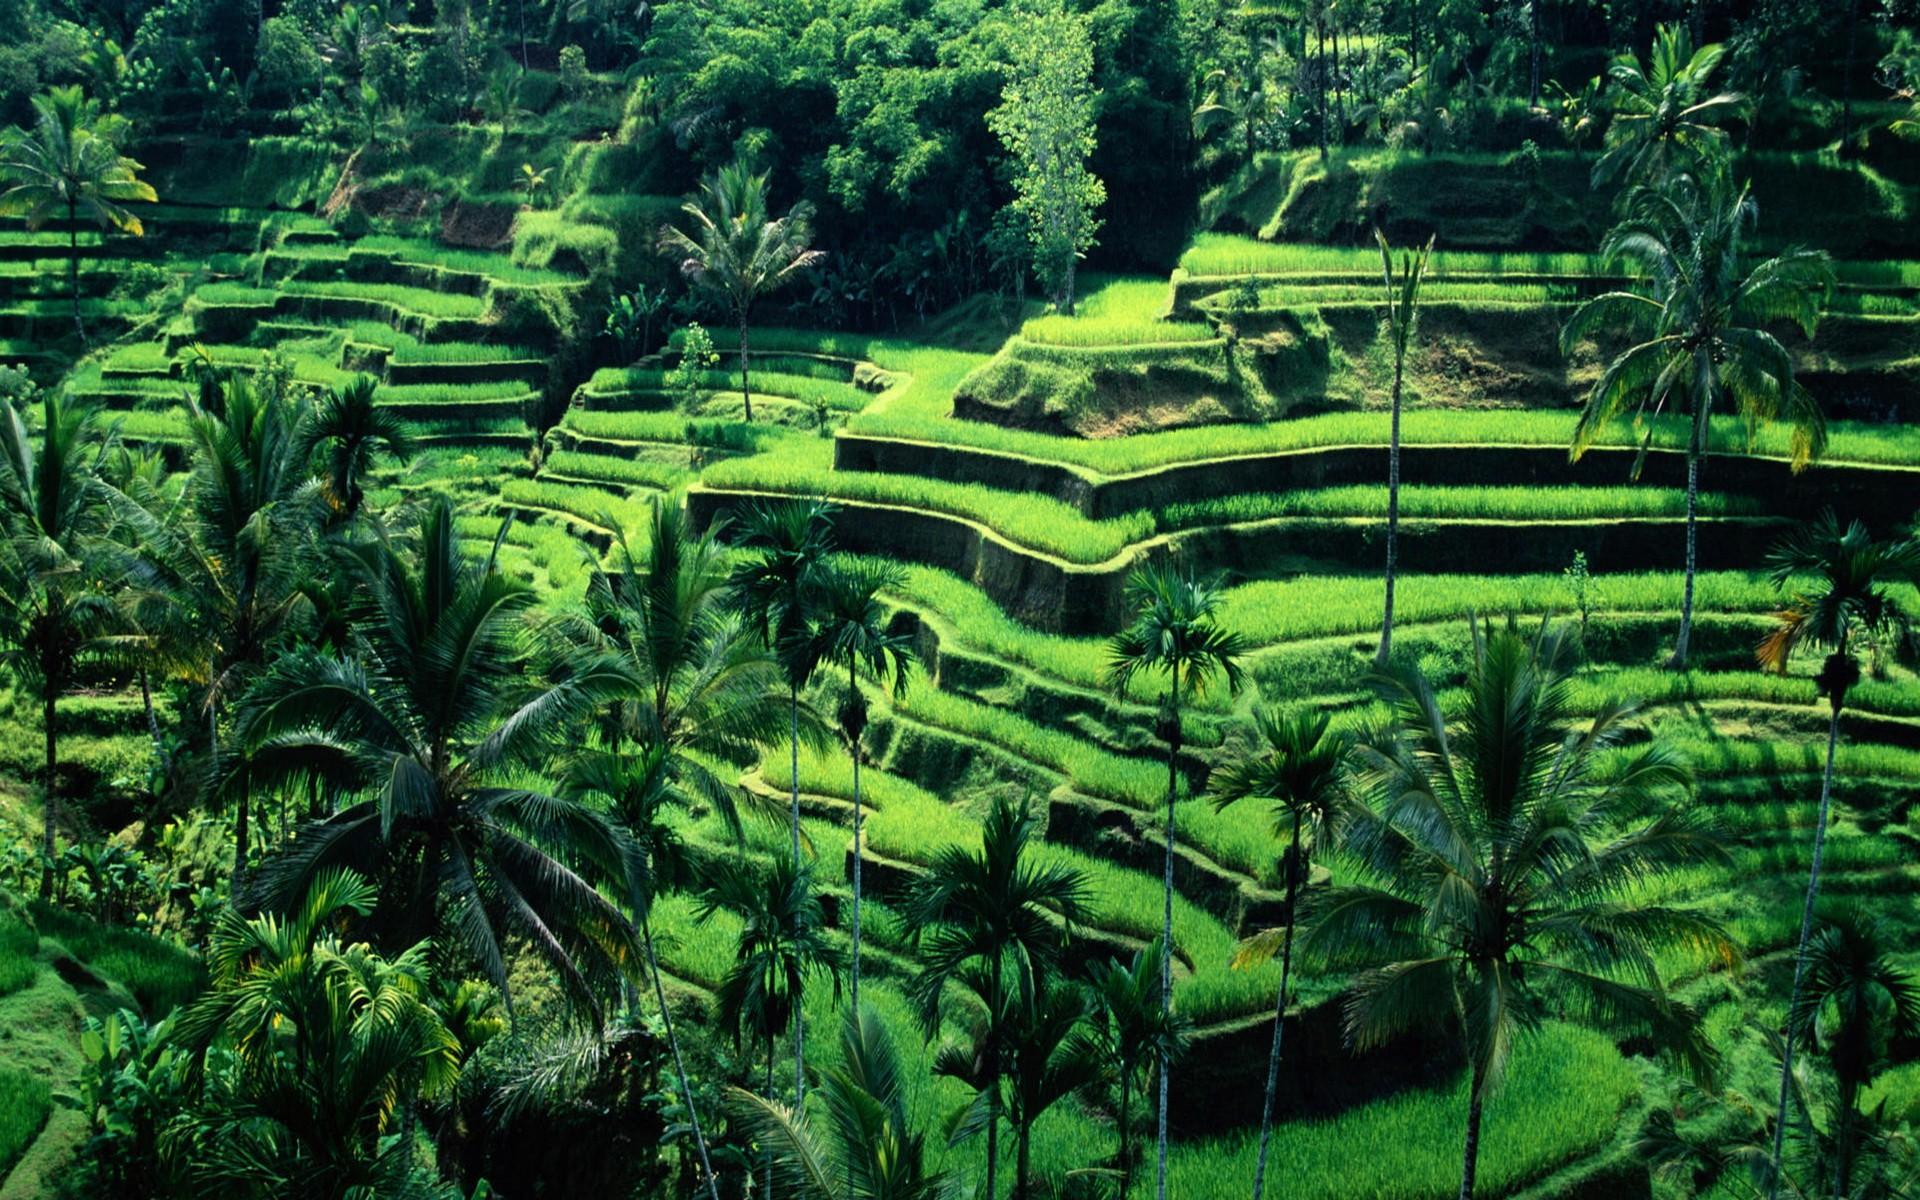 Fondos De Pantalla Verde Selva Bali Indonesia Campo En